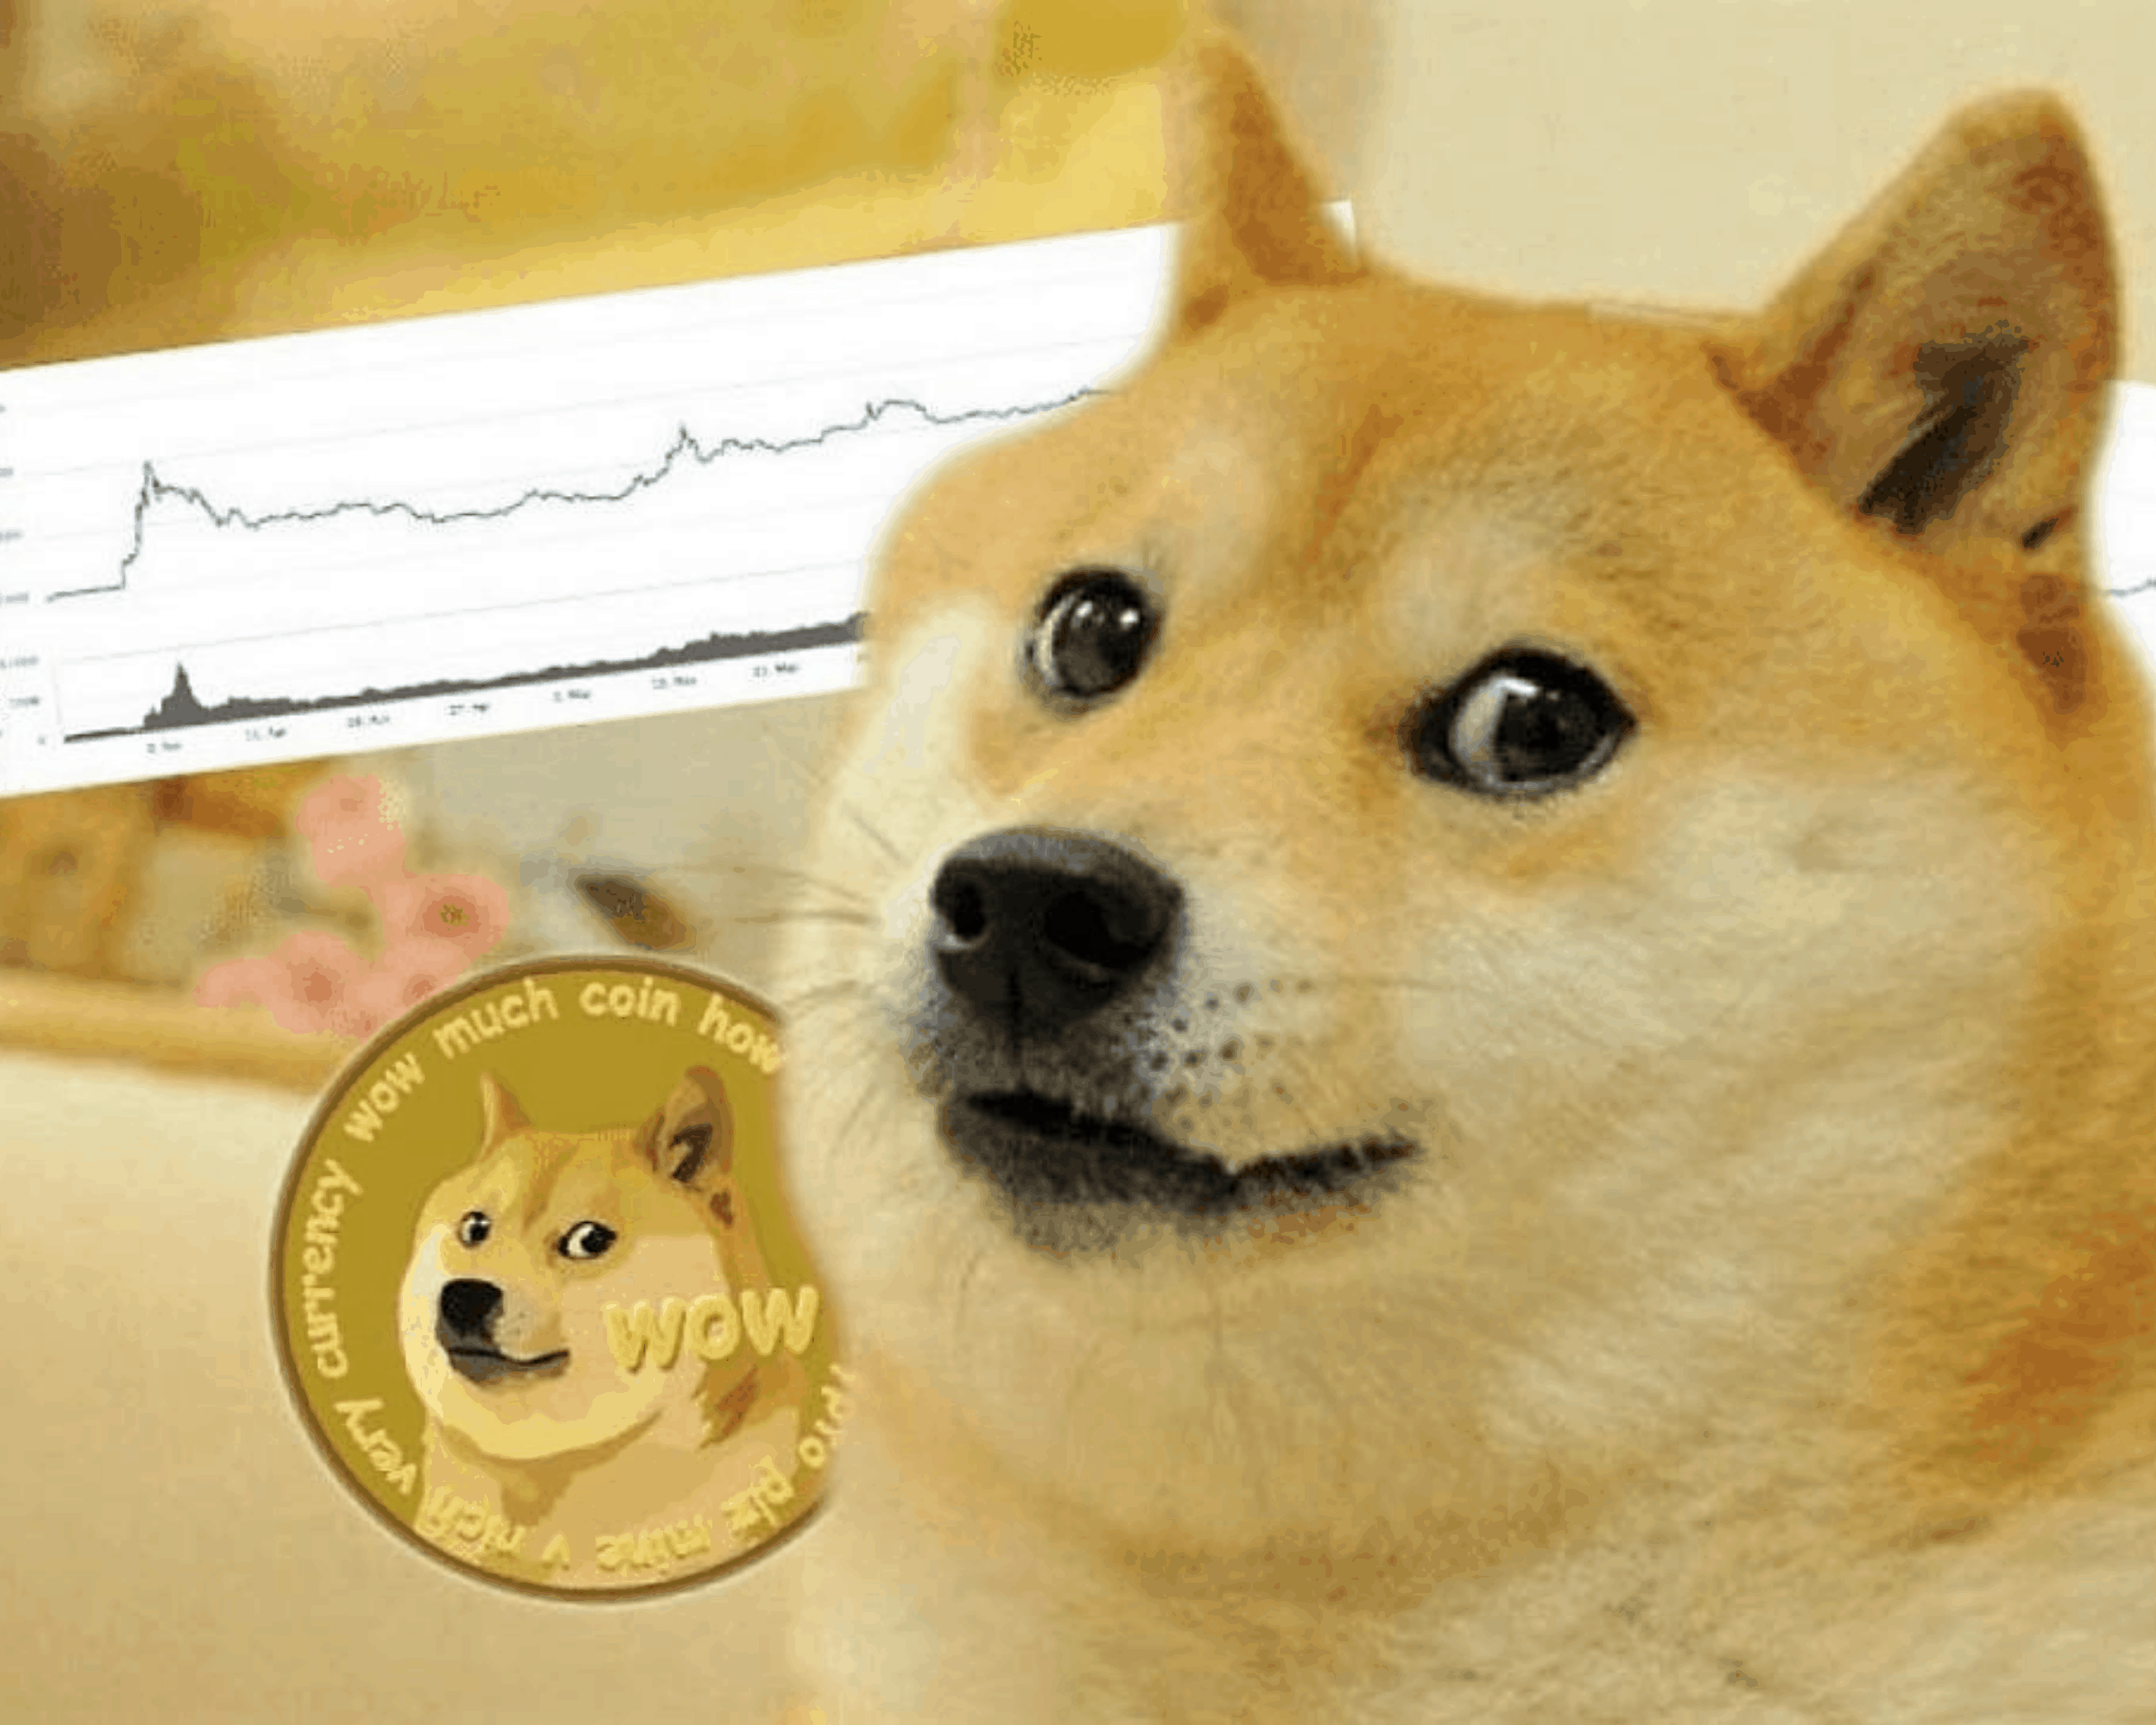 Newegg habilita pagos con DOGE